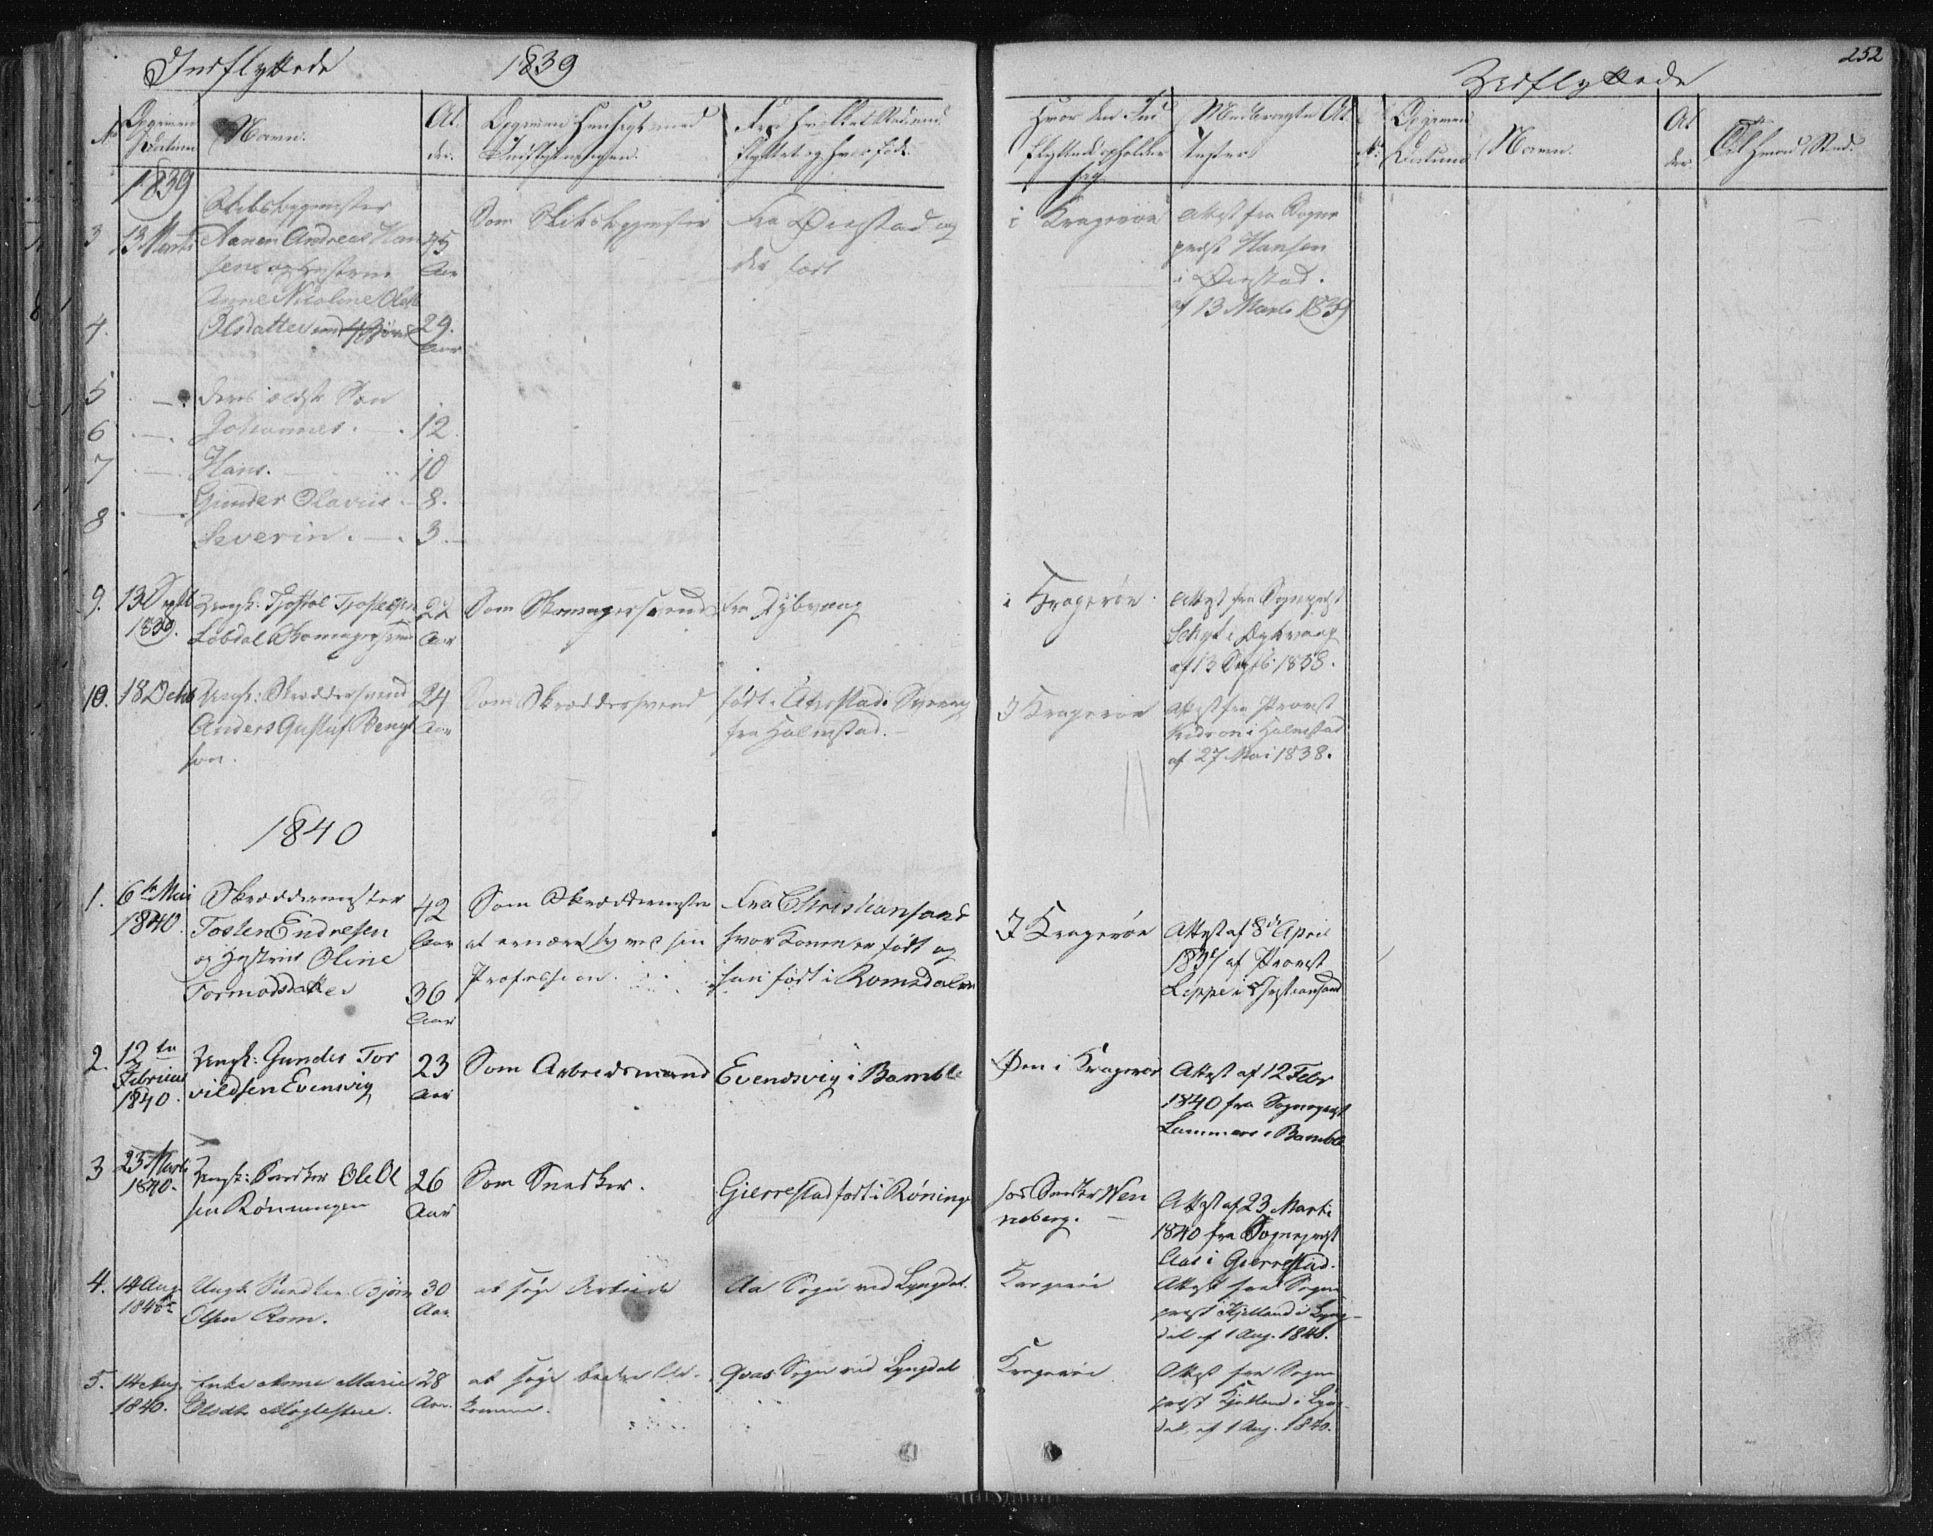 SAKO, Kragerø kirkebøker, F/Fa/L0005: Ministerialbok nr. 5, 1832-1847, s. 252